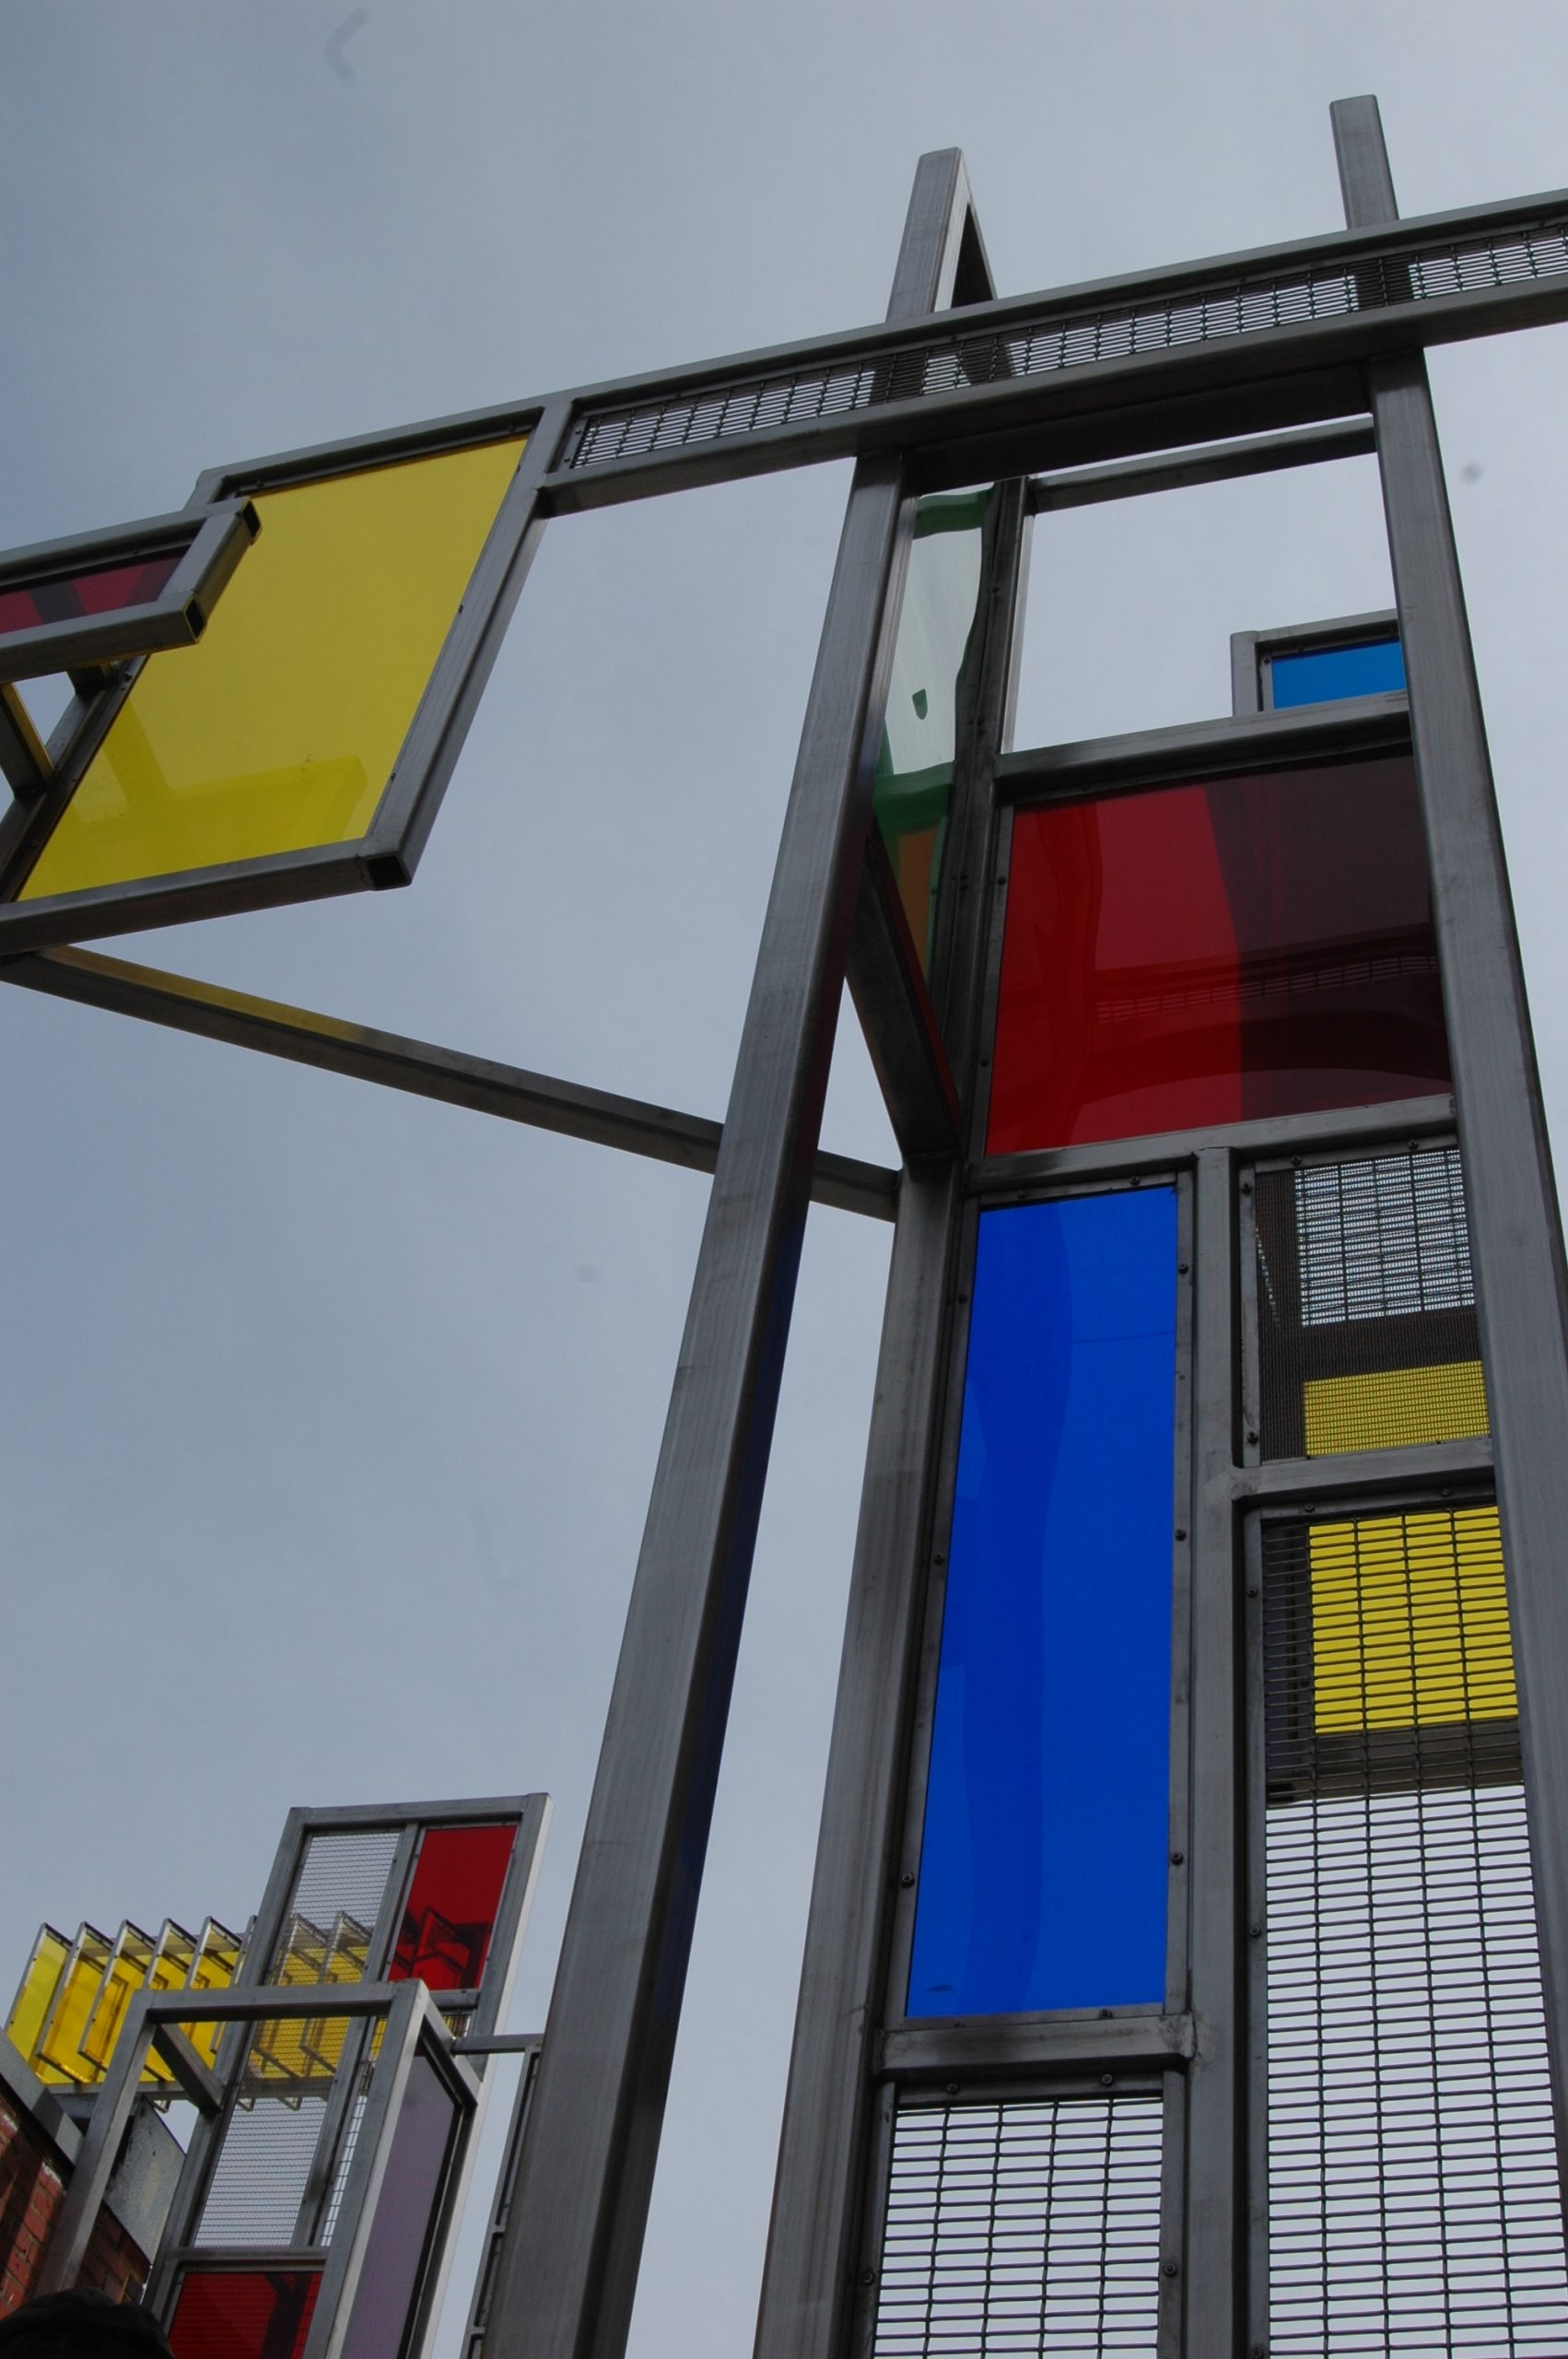 The Windows on Art Alley